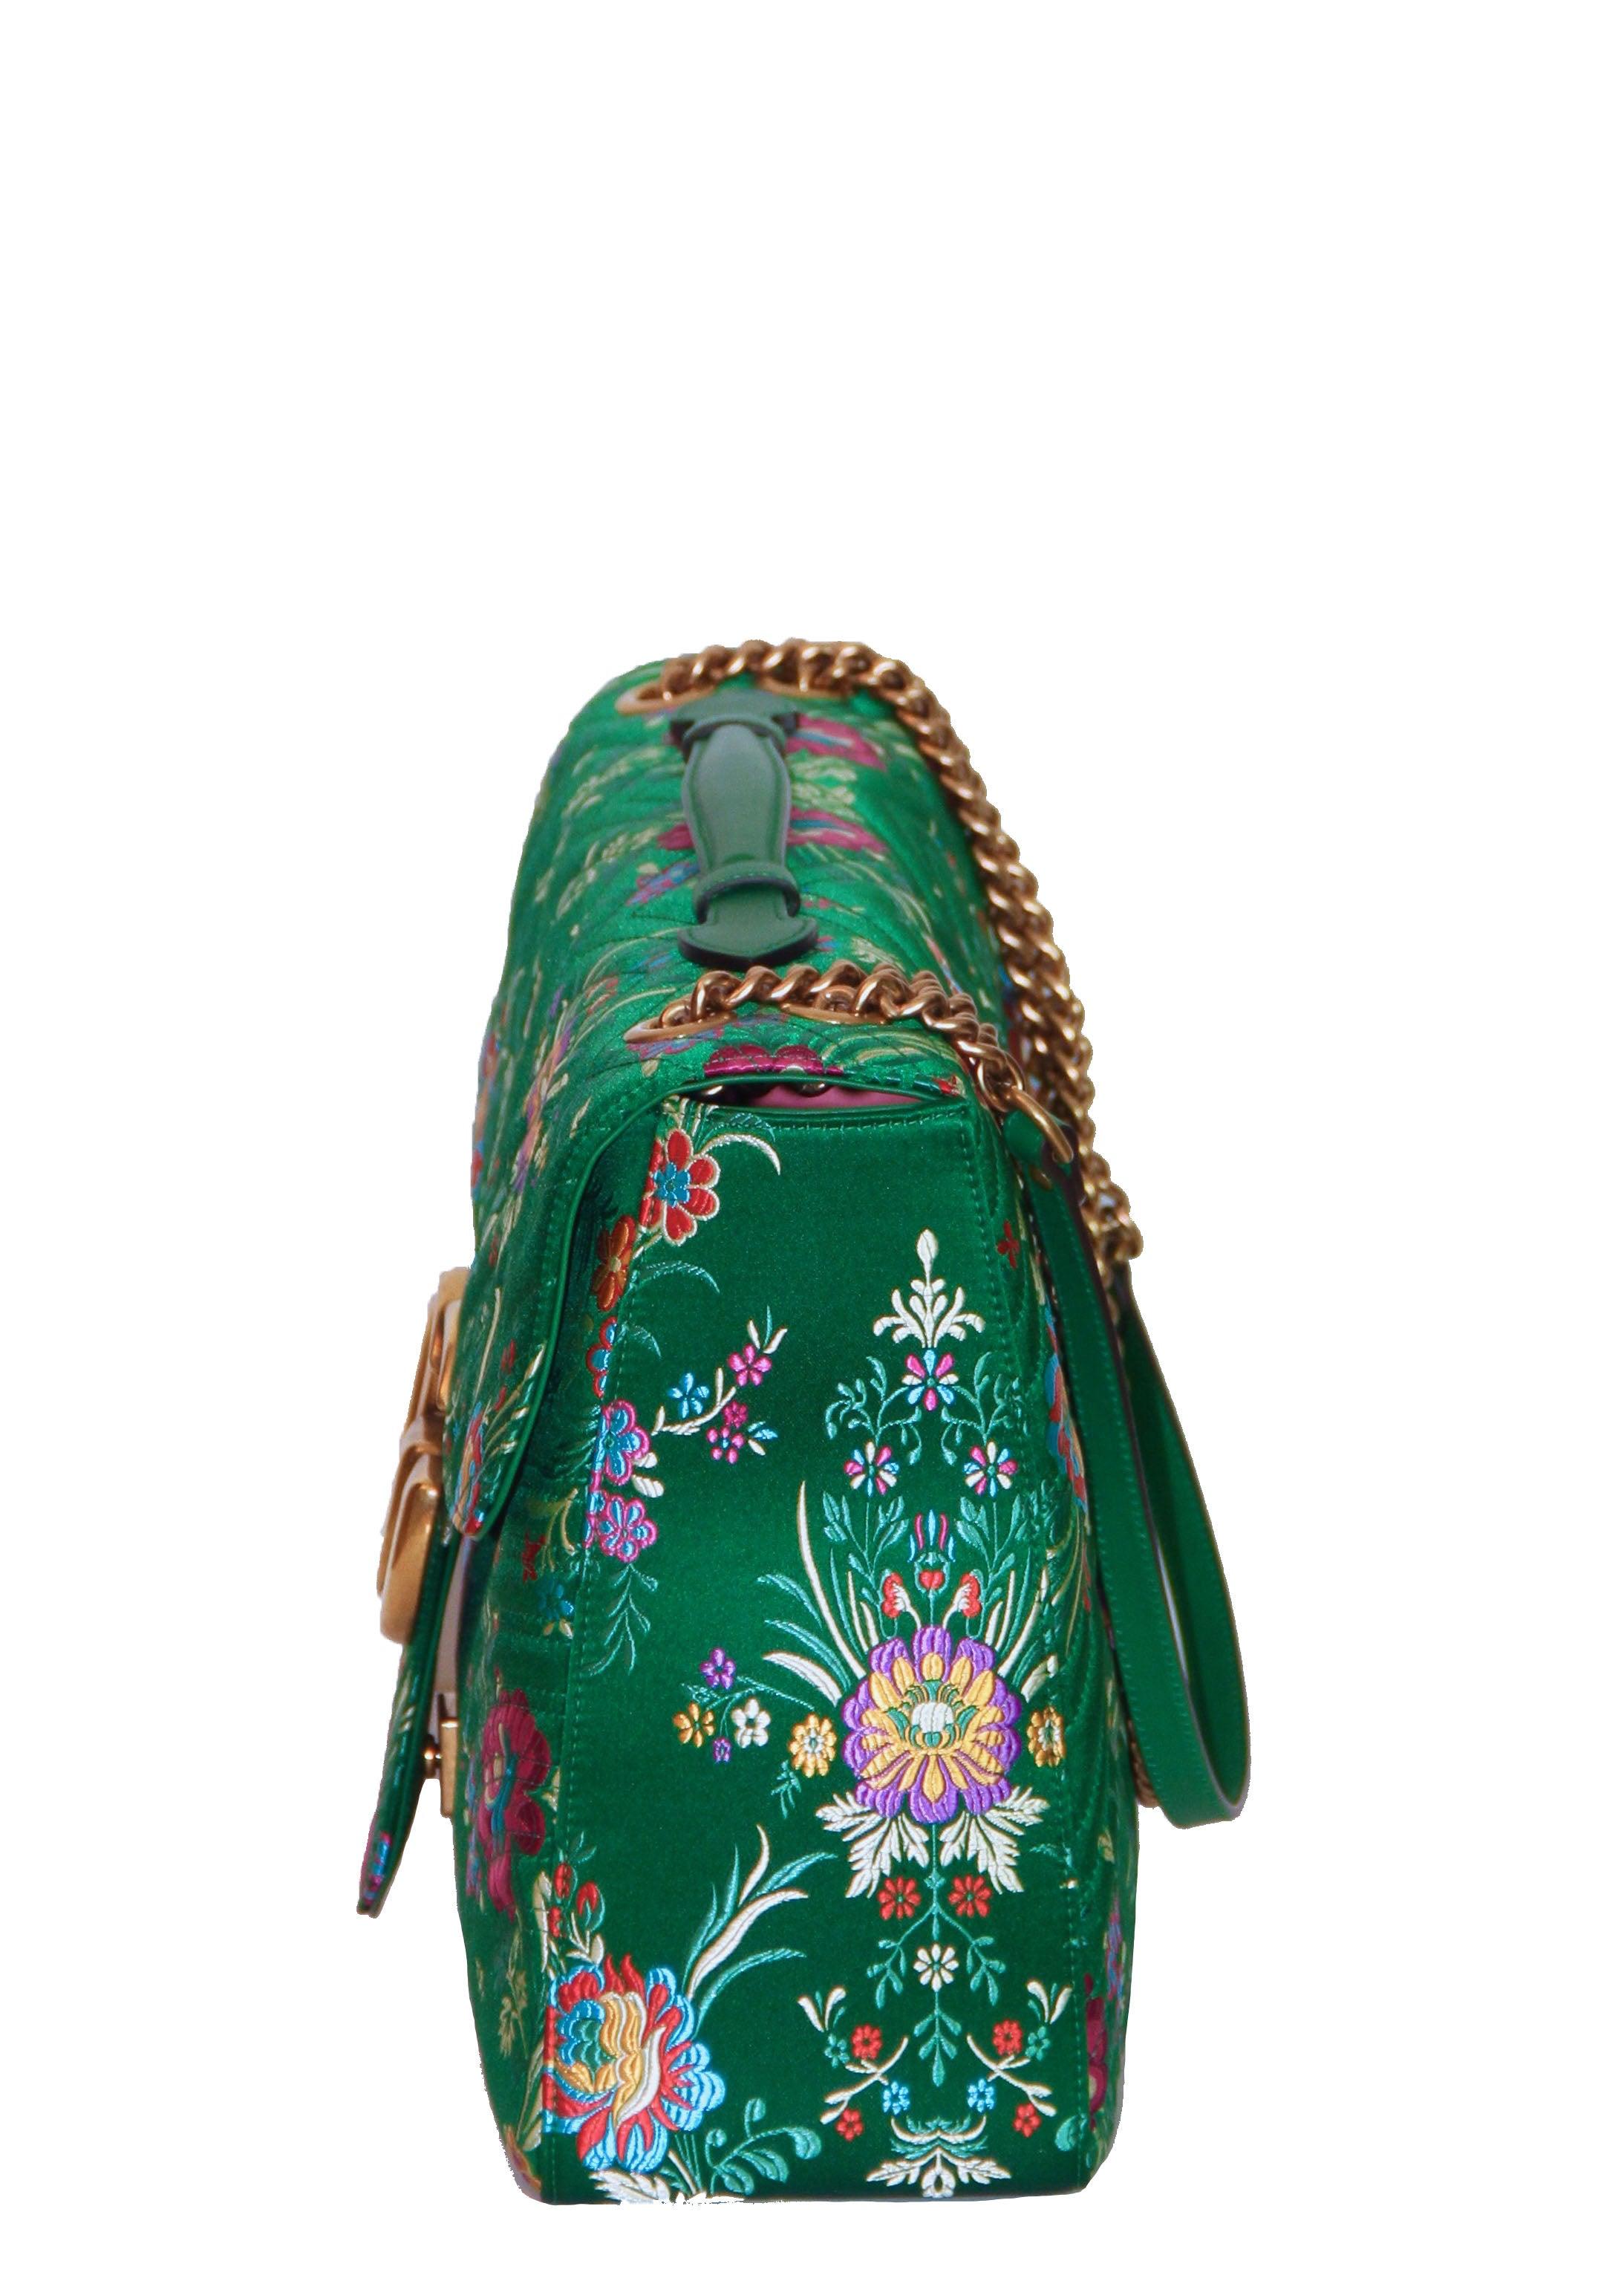 496ecc16b3d1 GUCCI GG Marmont Maxi Handbag Quilted Floral Jacquard at 1stdibs